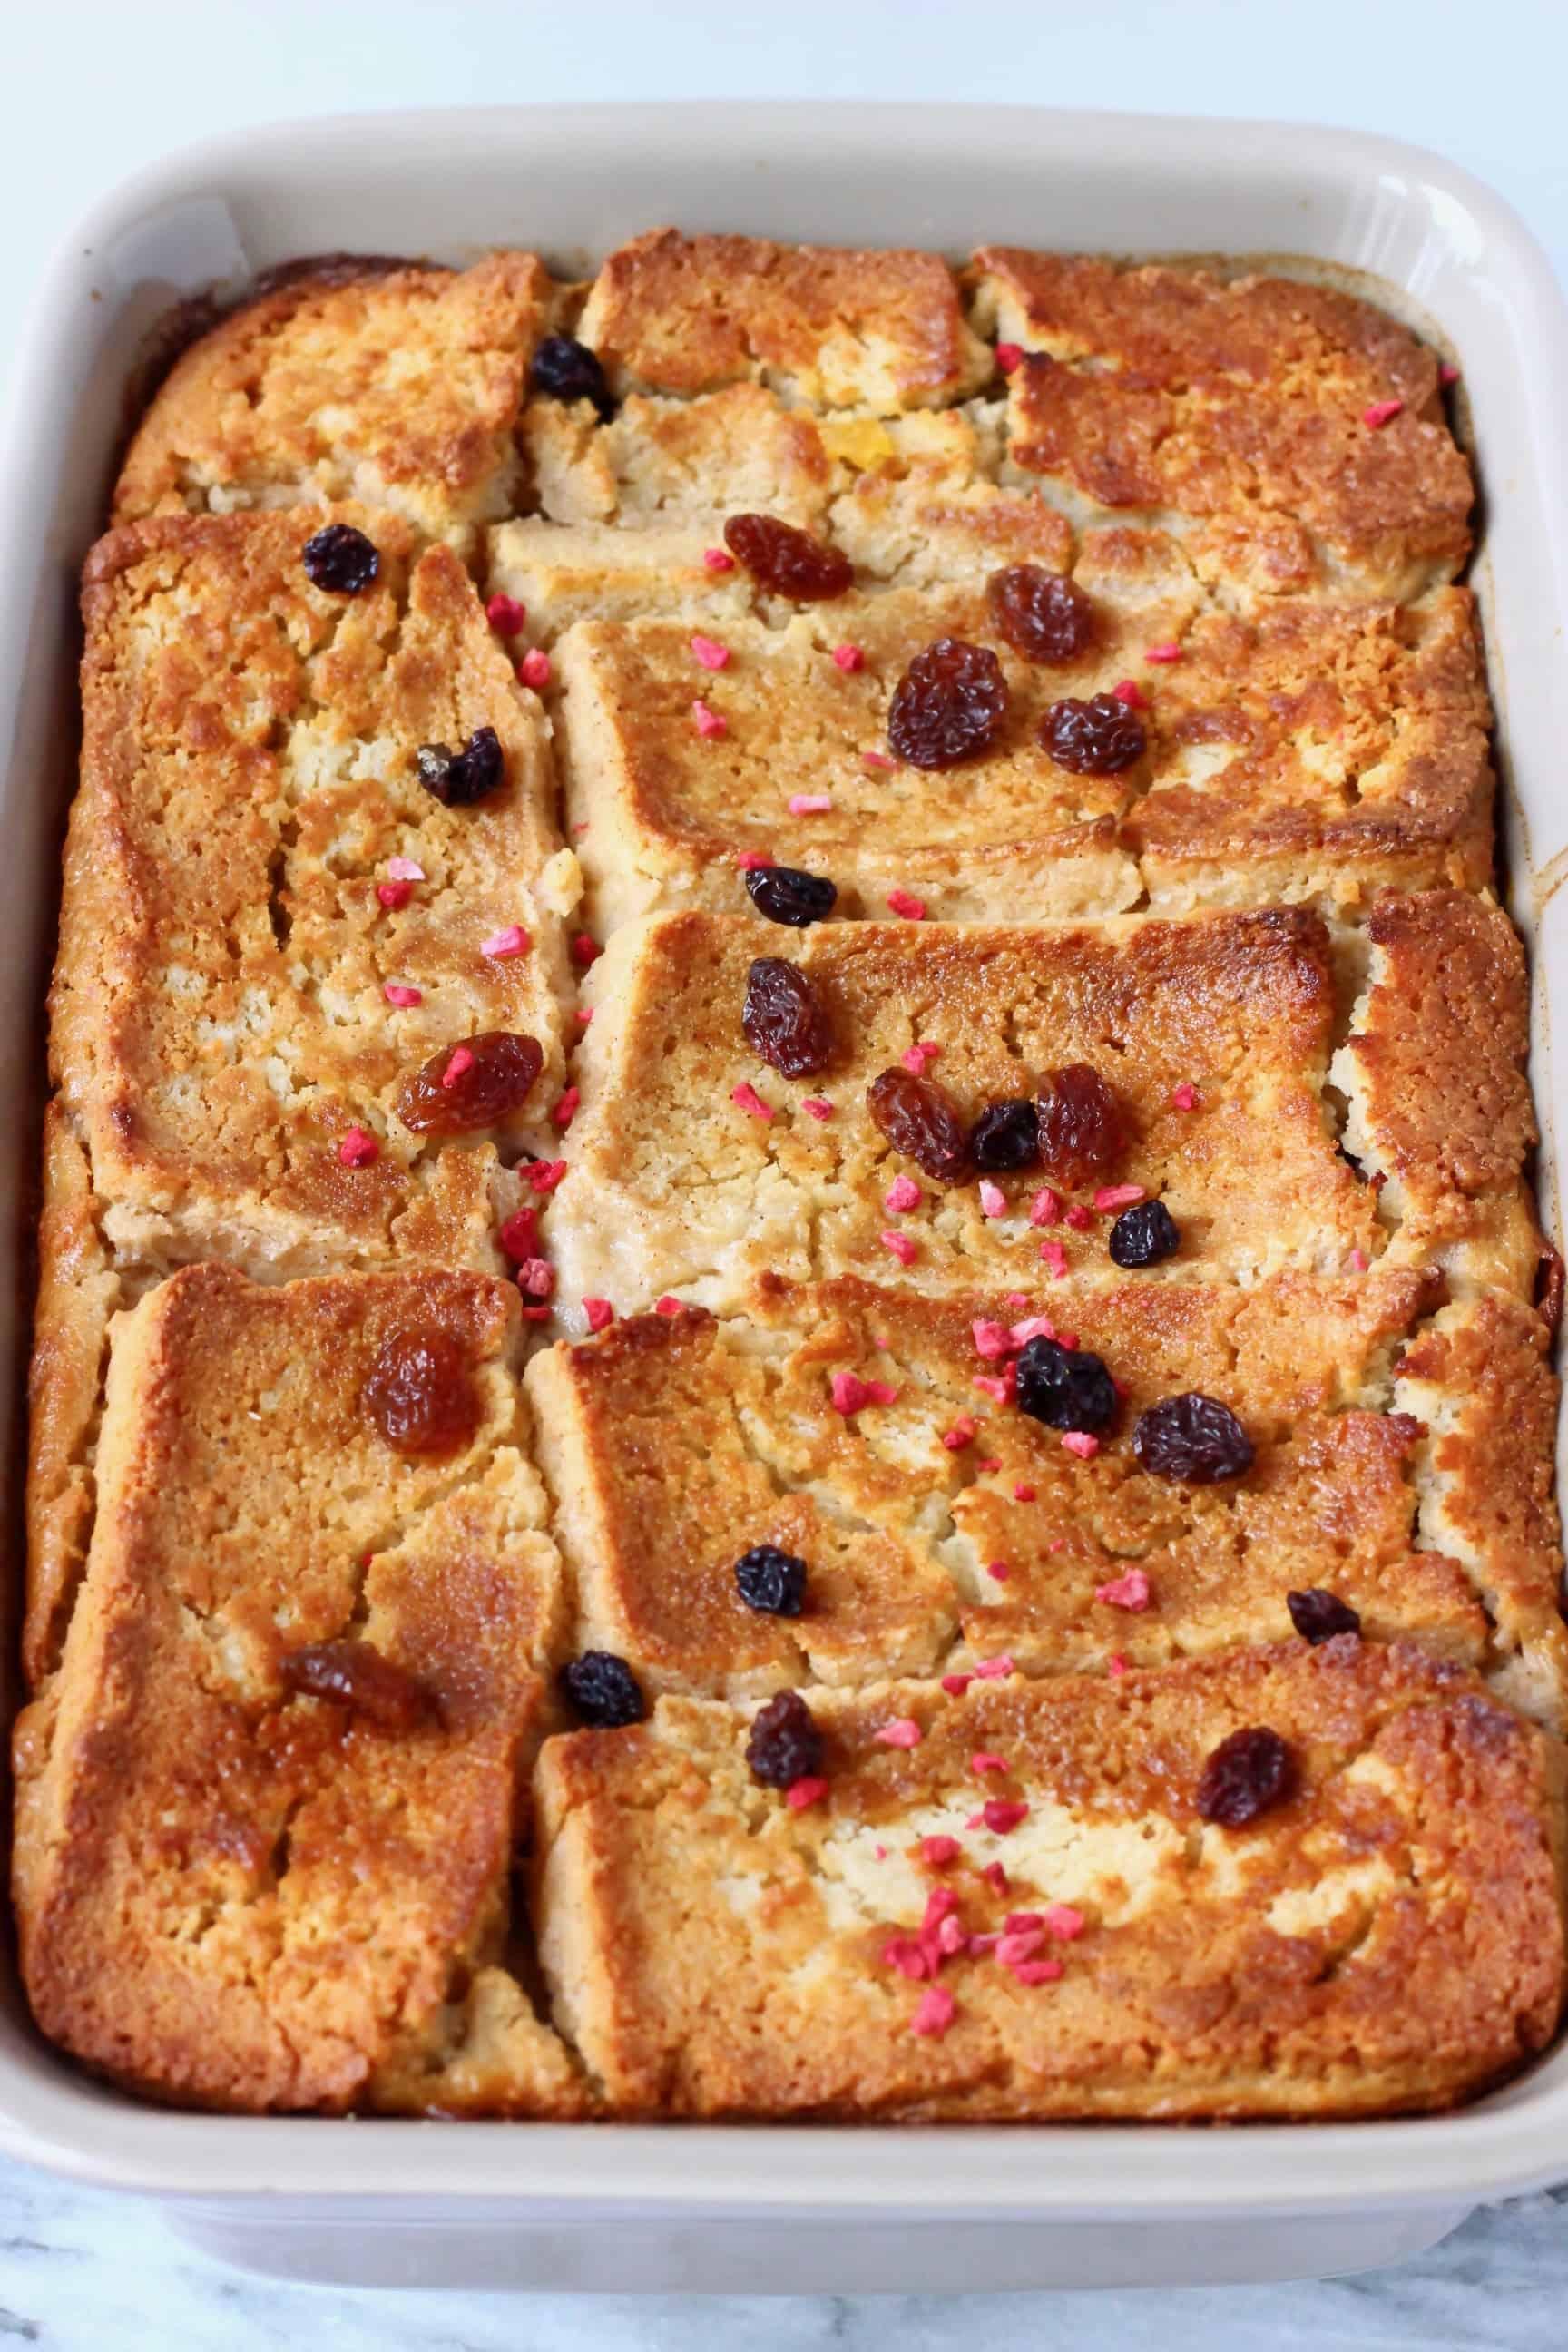 Vegan bread pudding in a grey rectangular baking dish sprinkled with raisins